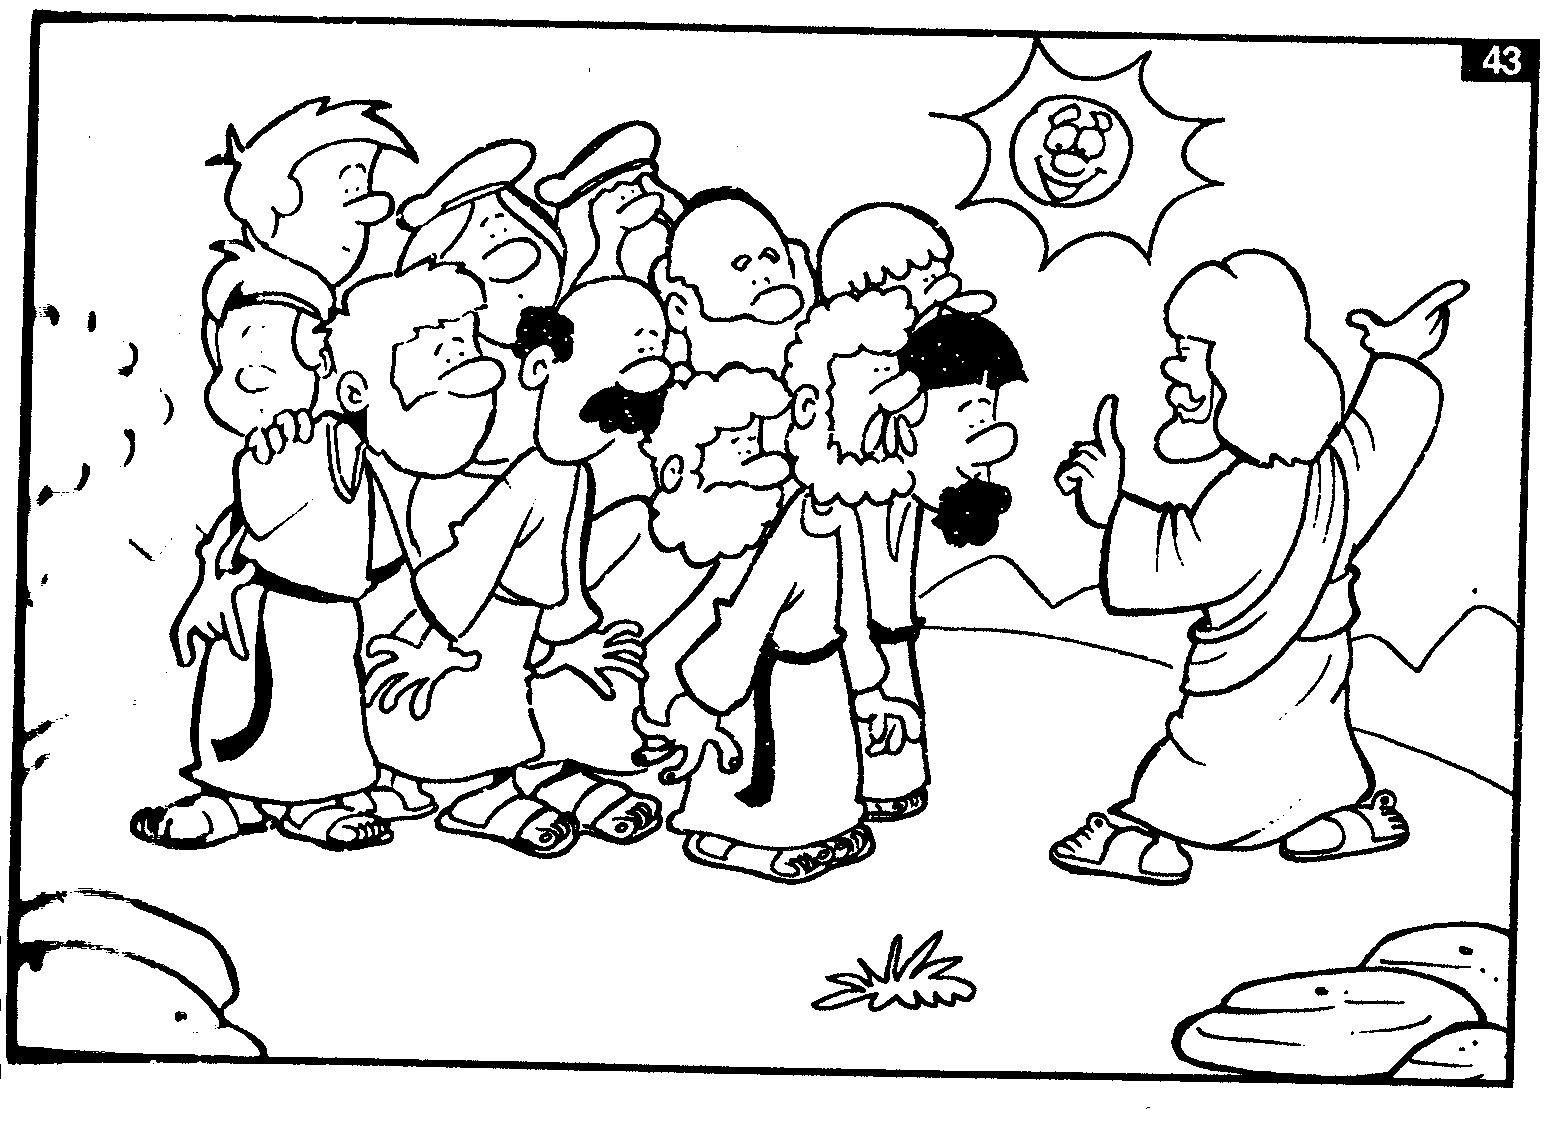 me aburre la religi u00d3n  historia ilustrada para colorear  muerte y resurrecci u00d3n de jes u00das